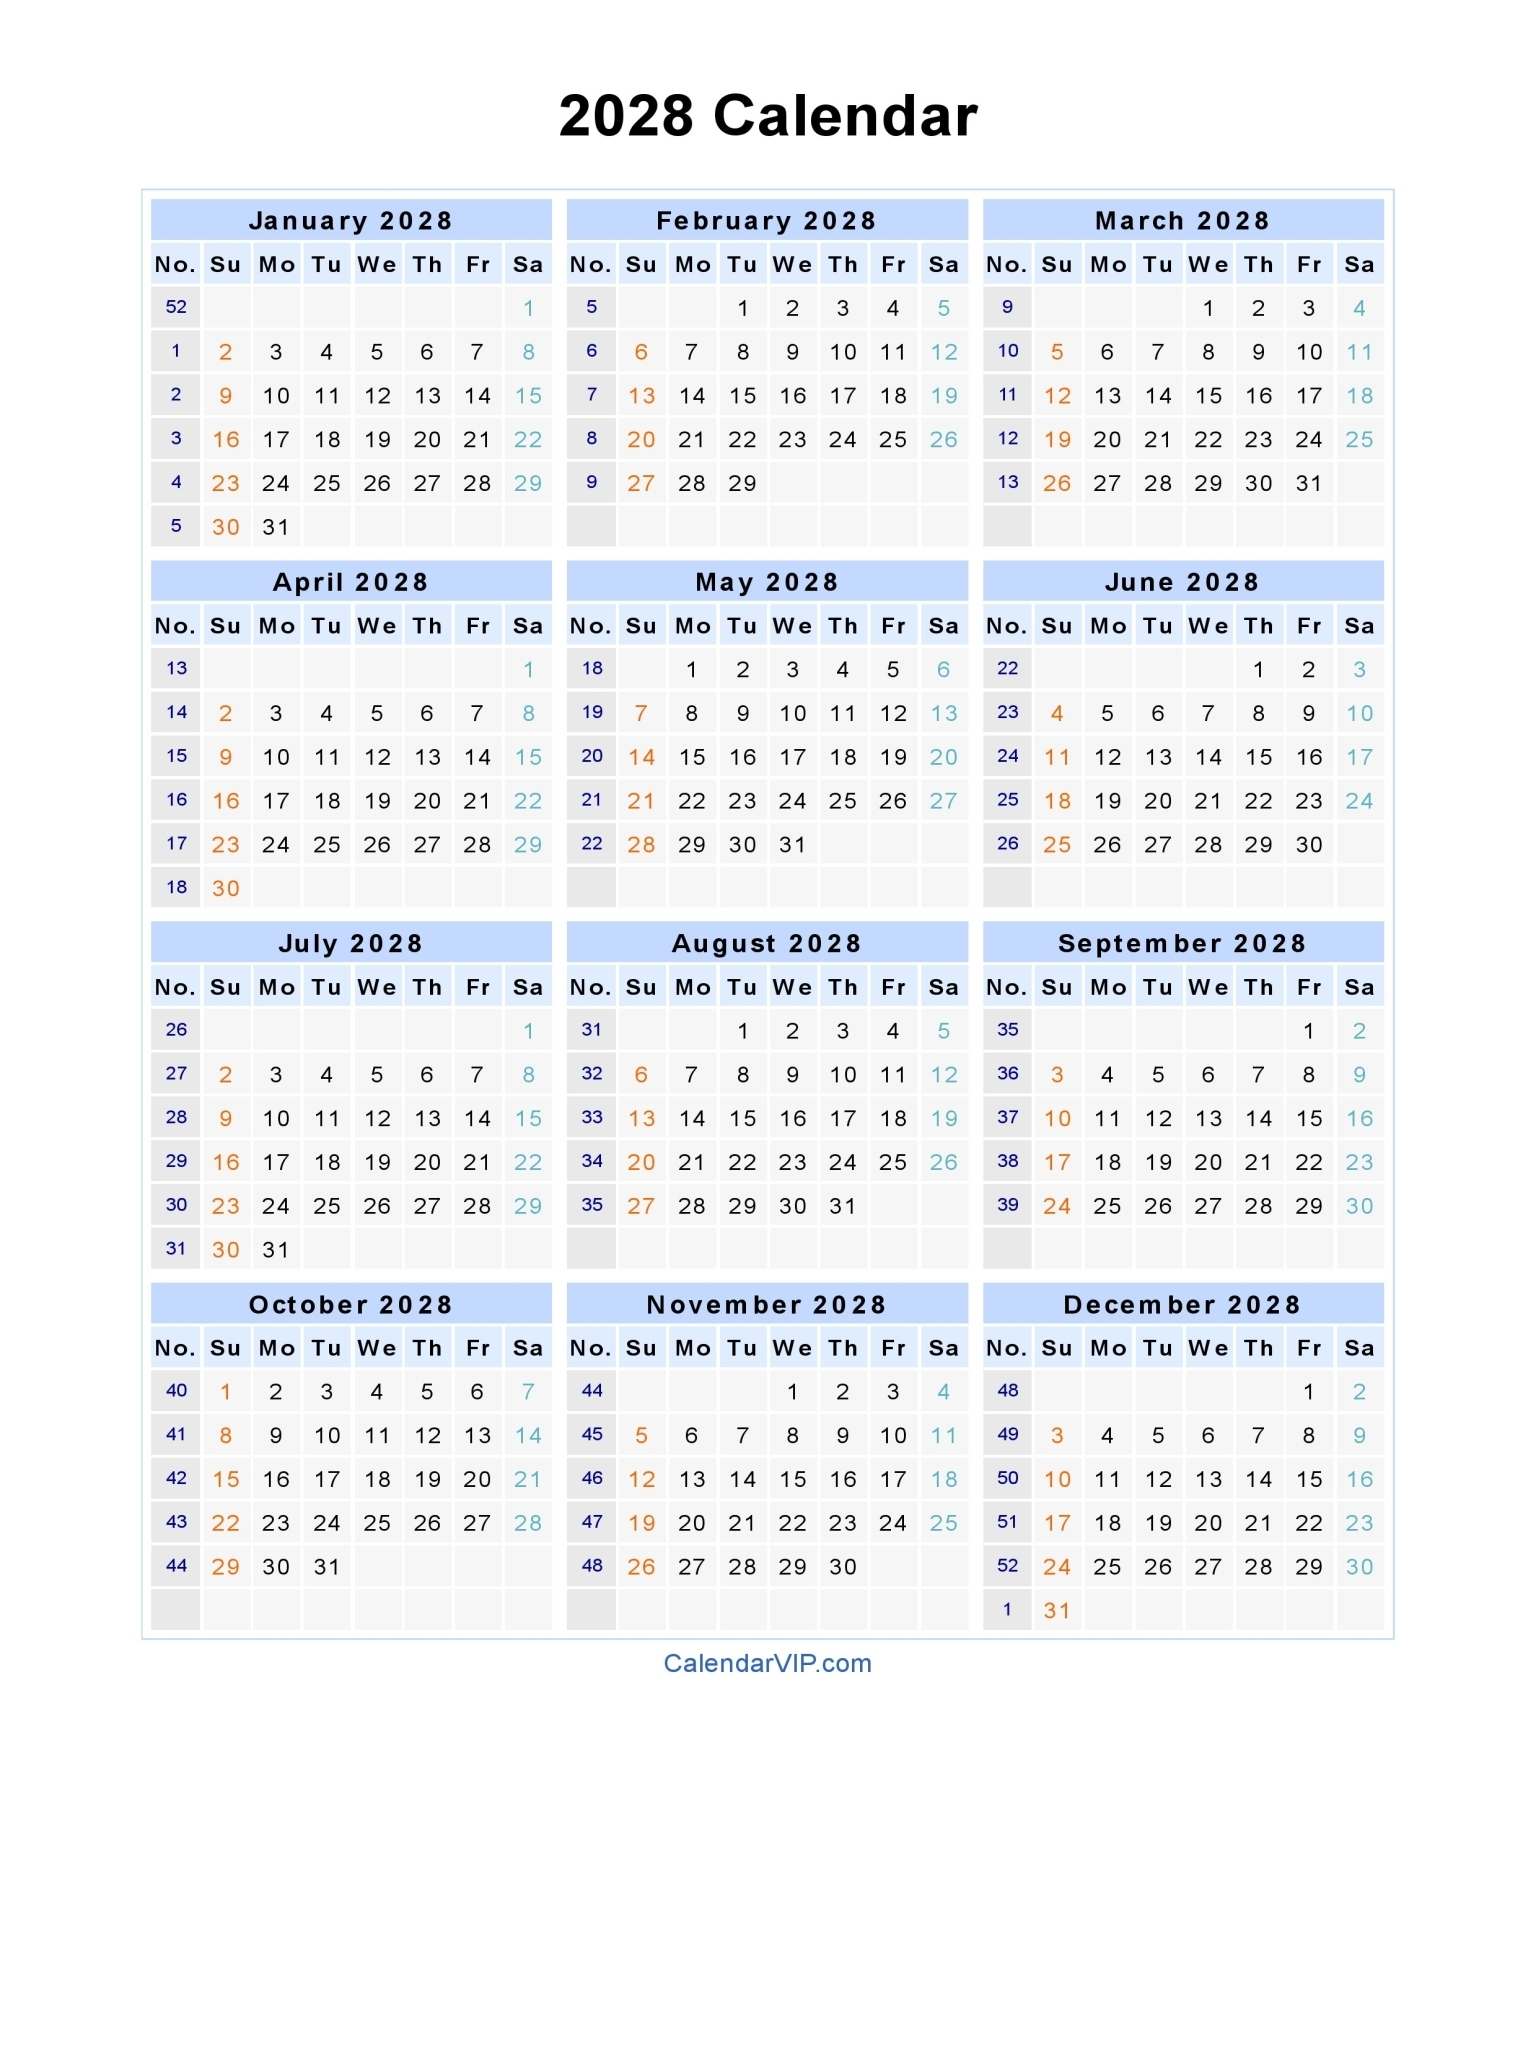 2028 Calendar - Blank Printable Calendar Template In Pdf